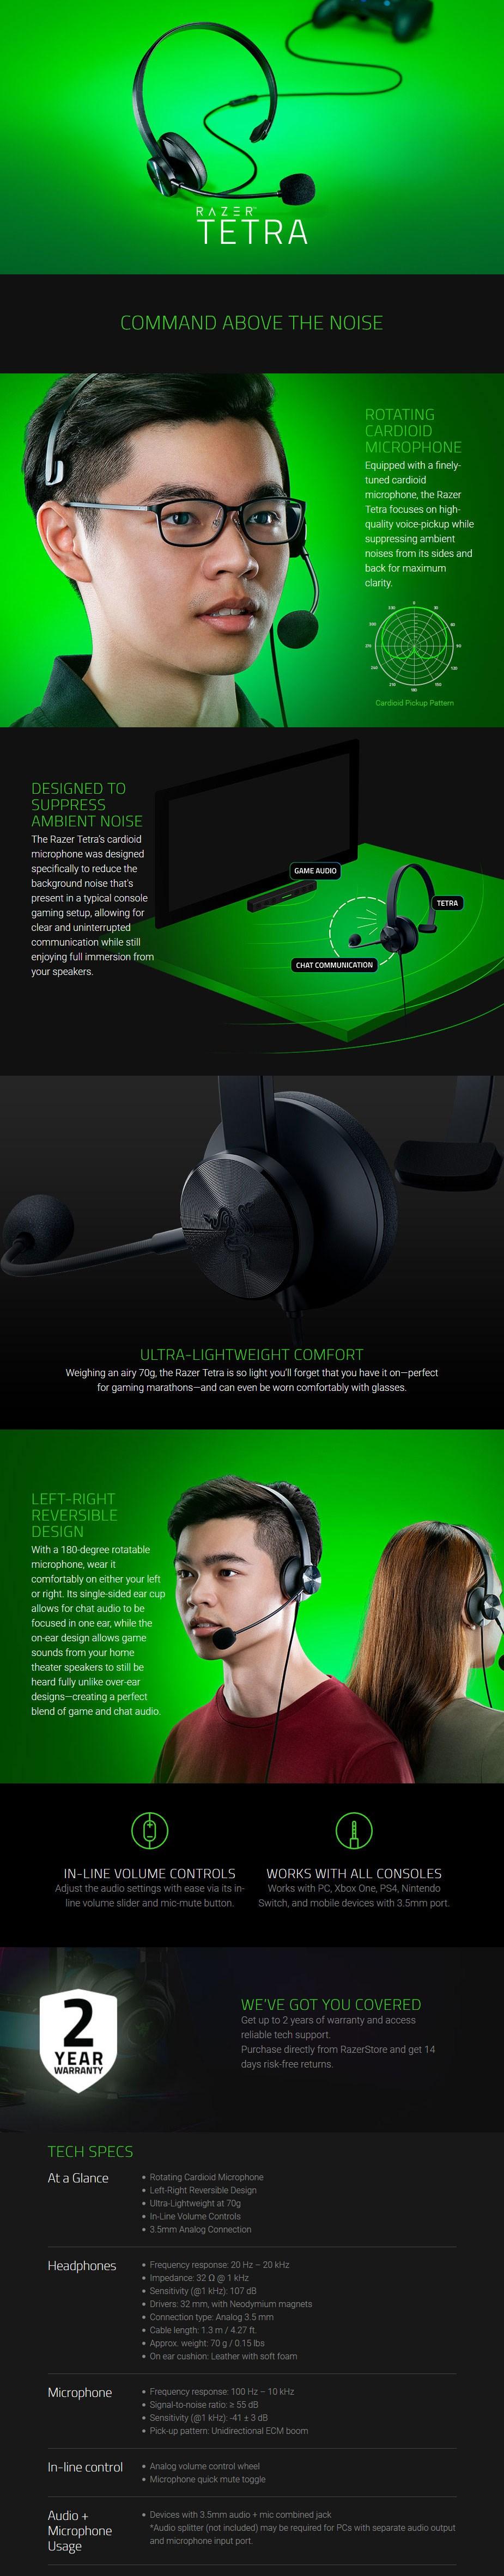 razer-tetra-multiplaaftform-mono-gaming-headset-ac29344-4.jpg